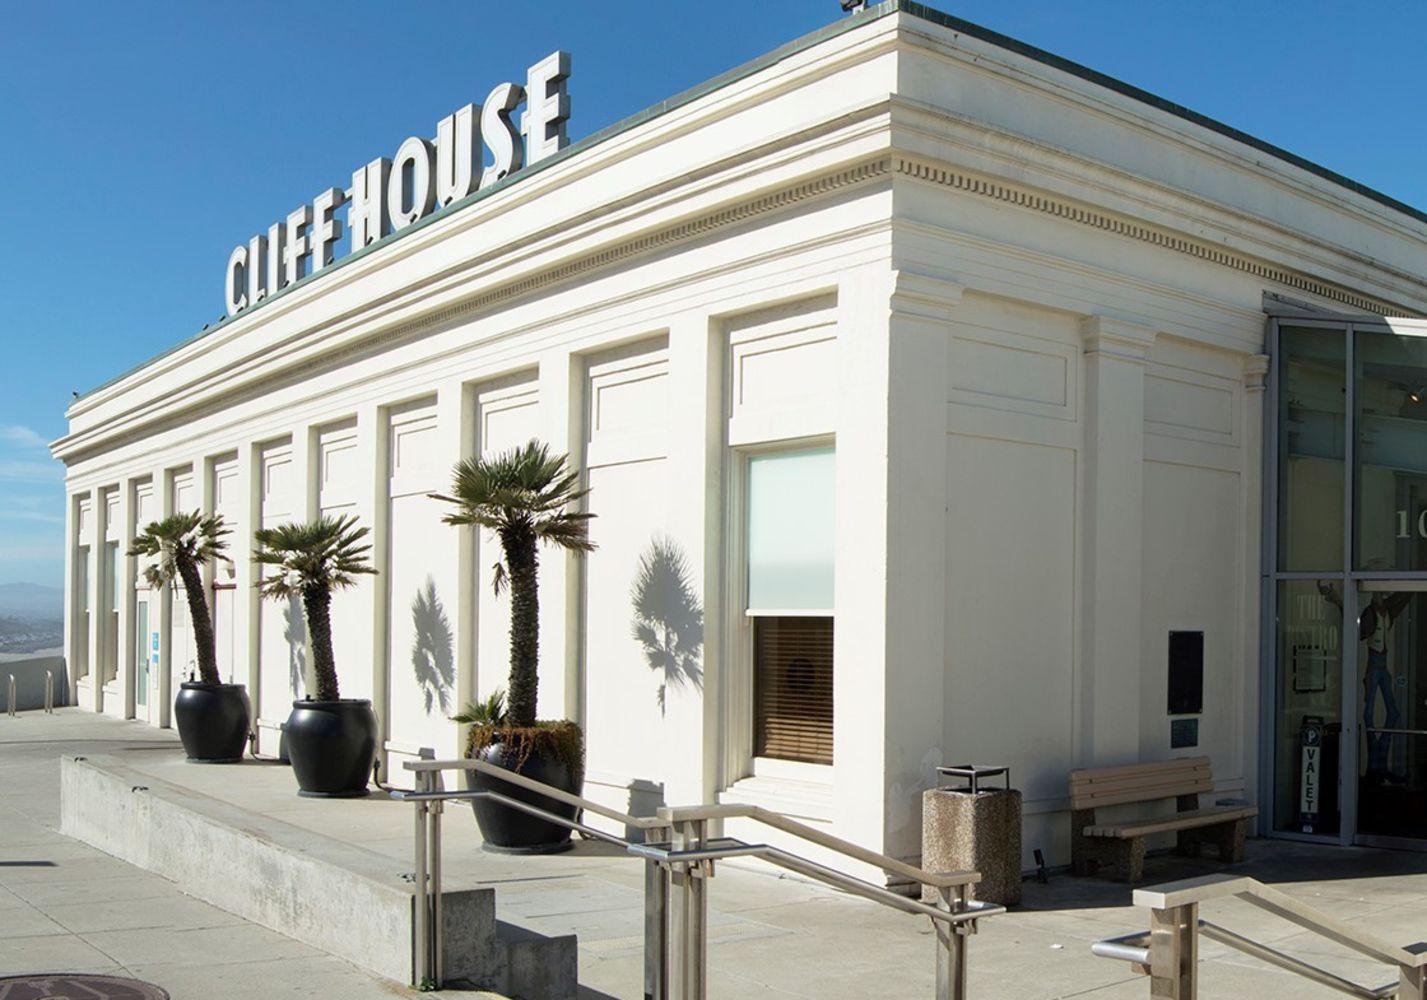 Day 2 - The Cliff House - San Francisco Landmark